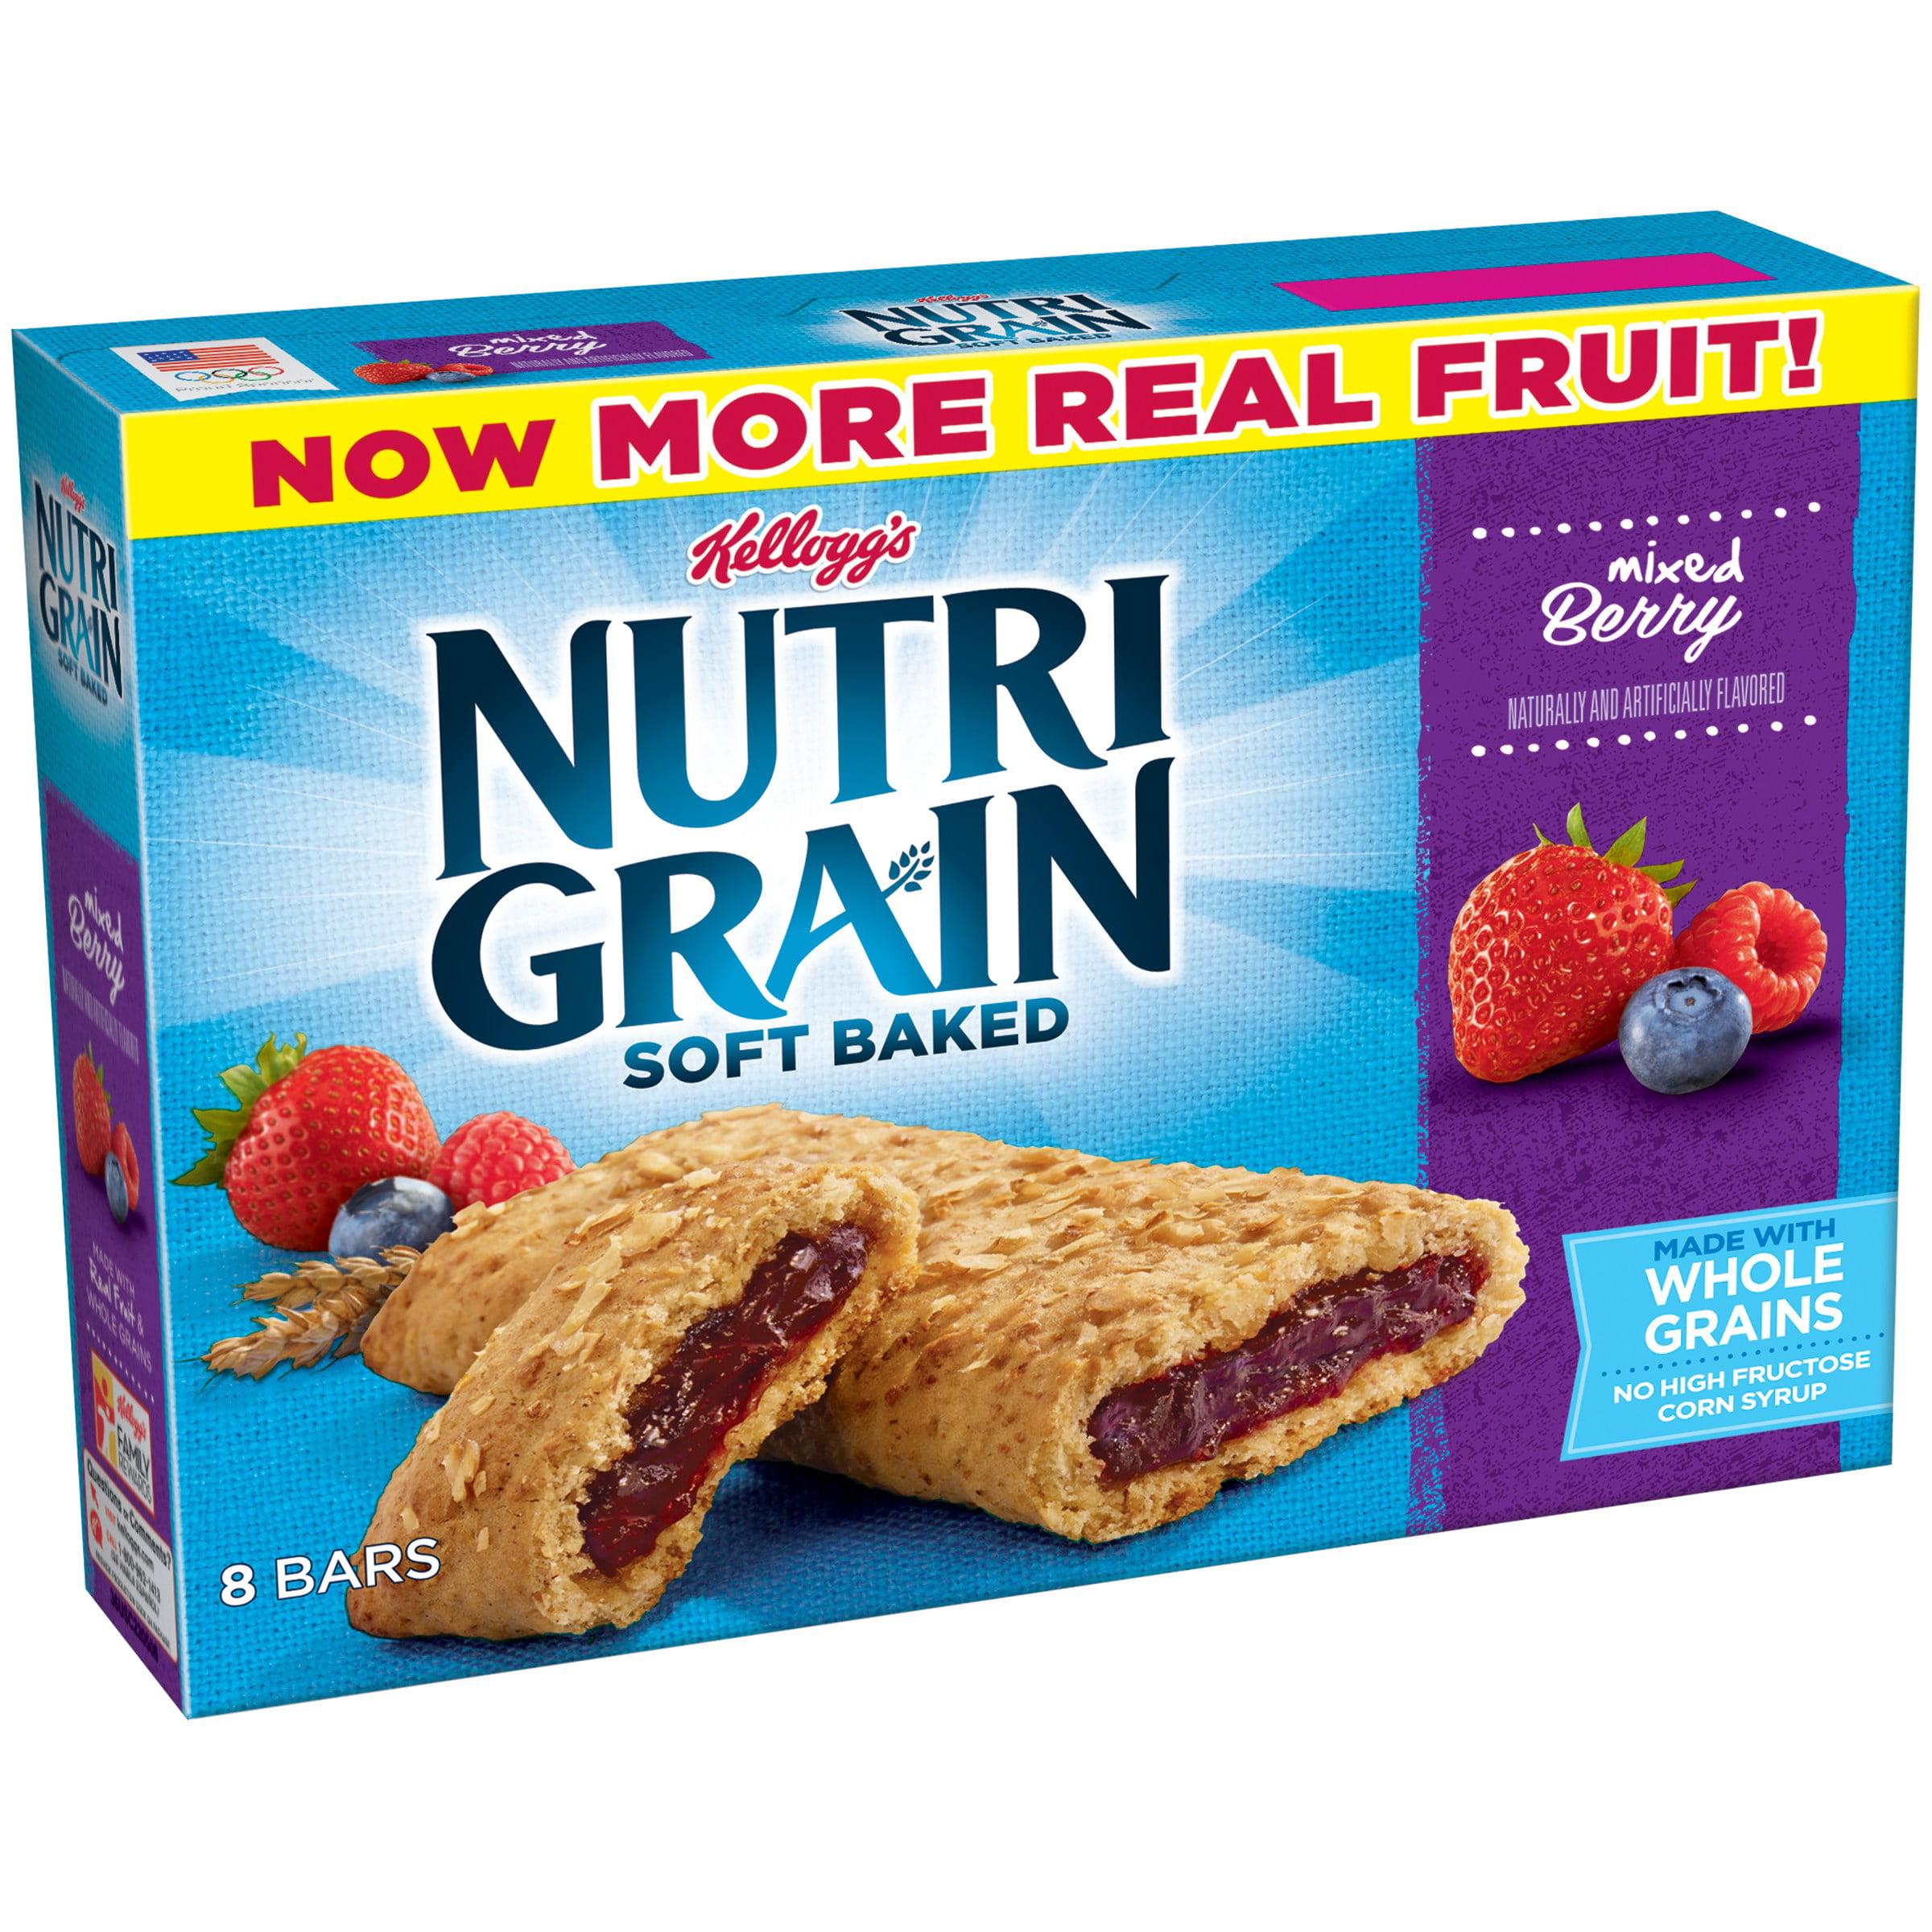 Kellogg's Nutri Grain Mixed Berry Breakfast Bars 8-1.3 oz. Packs